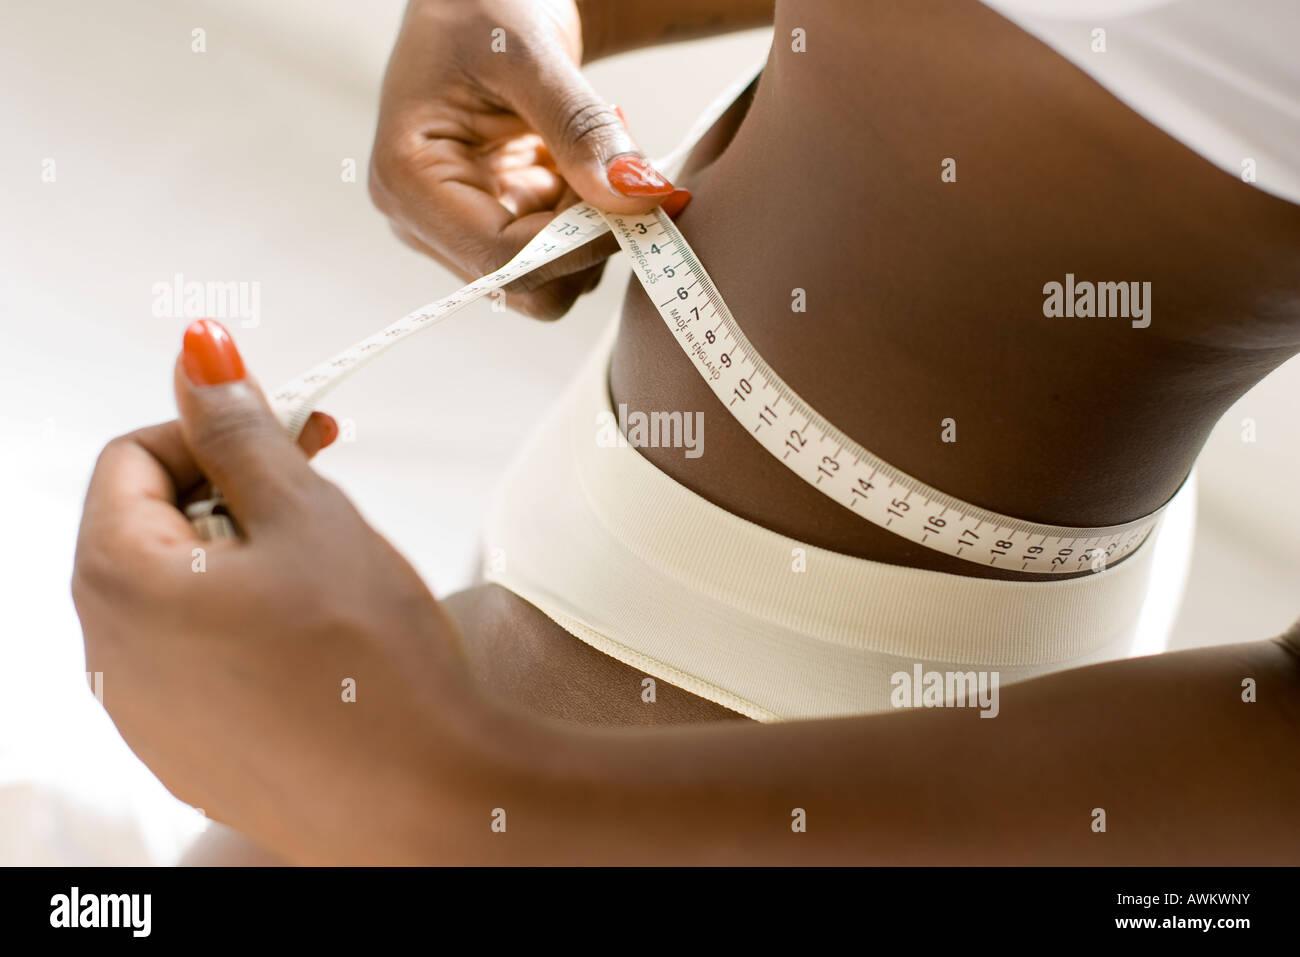 ethnic woman measuring her waist - Stock Image